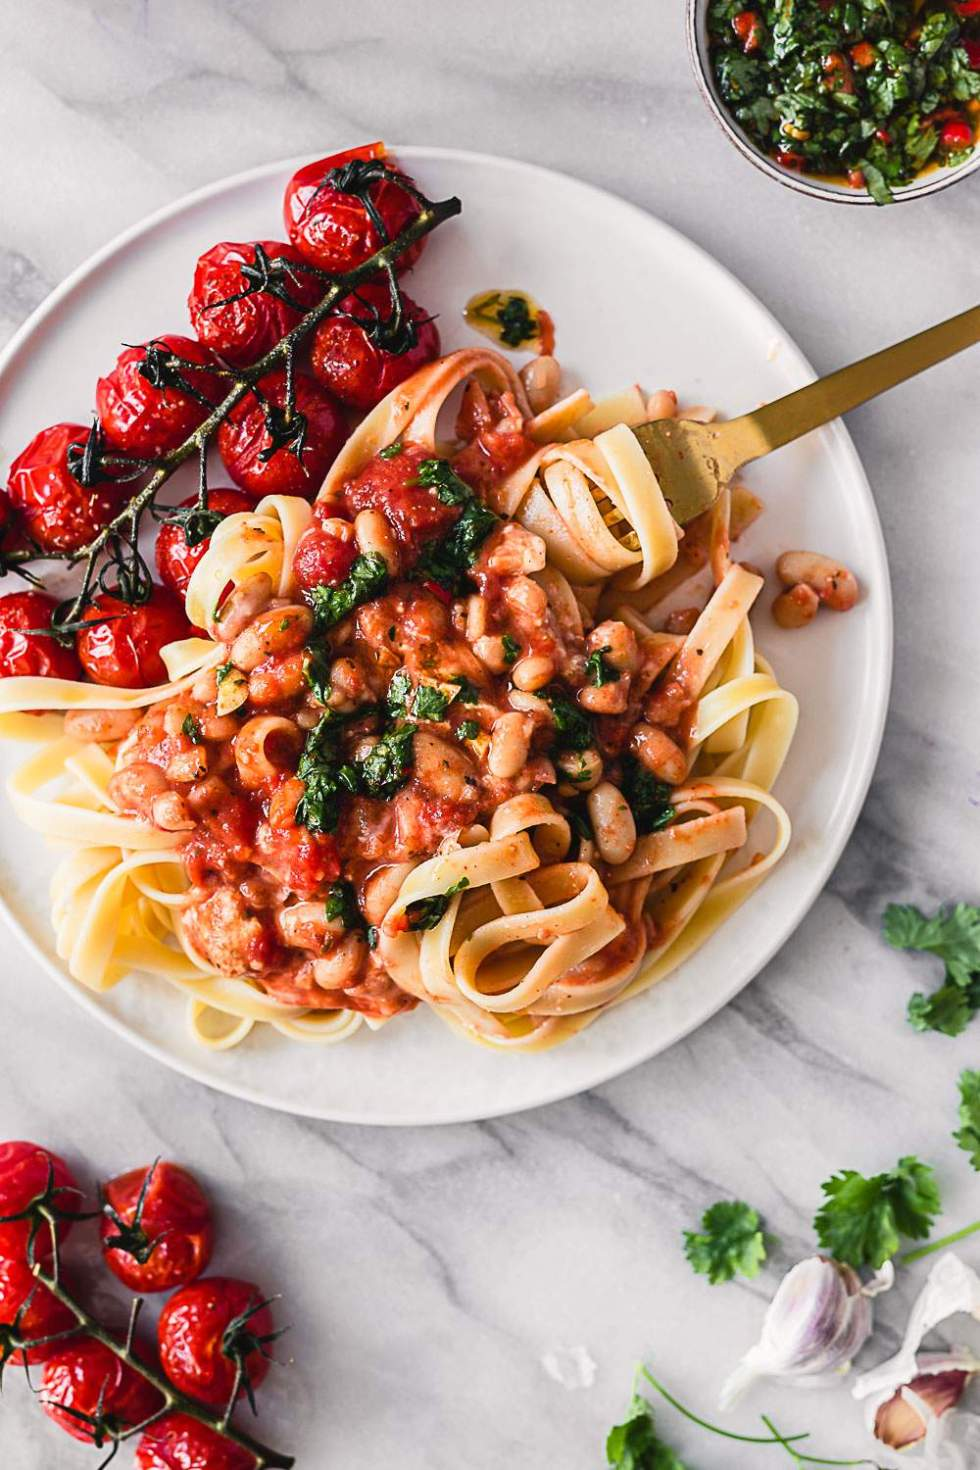 Tomato baked white beans with vegan feta and chimichurri